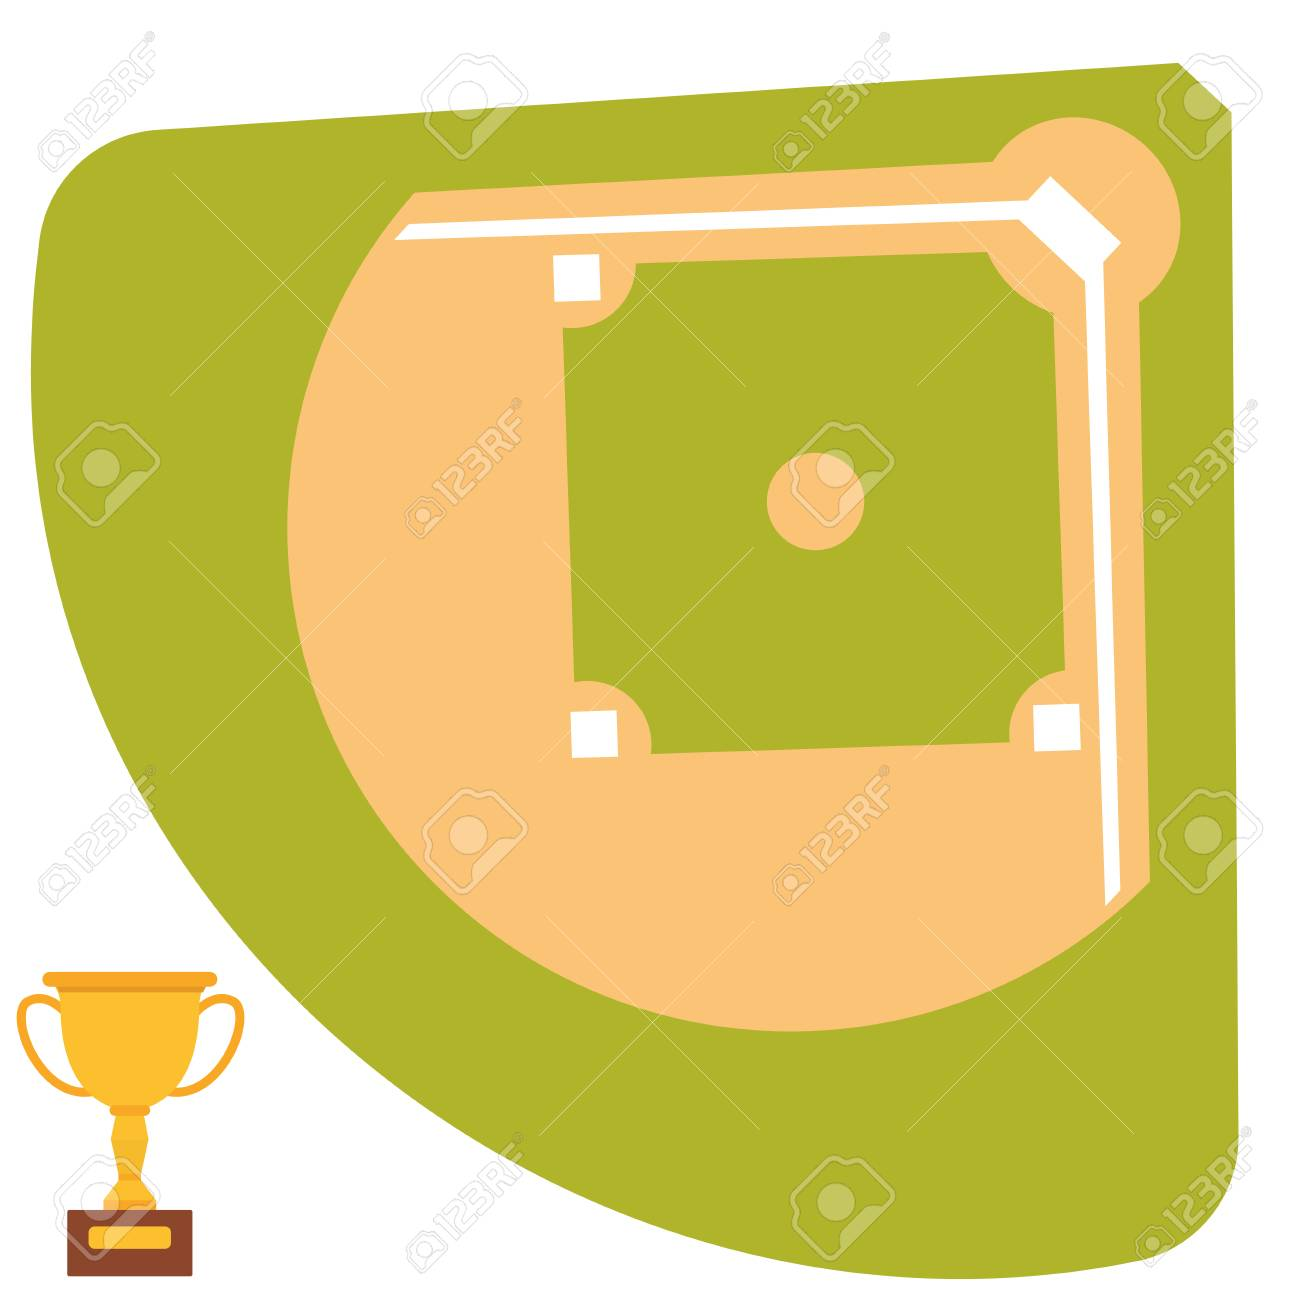 baseball field cartoon icon batting design american game athlete rh 123rf com cartoon baseball field images Cartoon Baseball Player